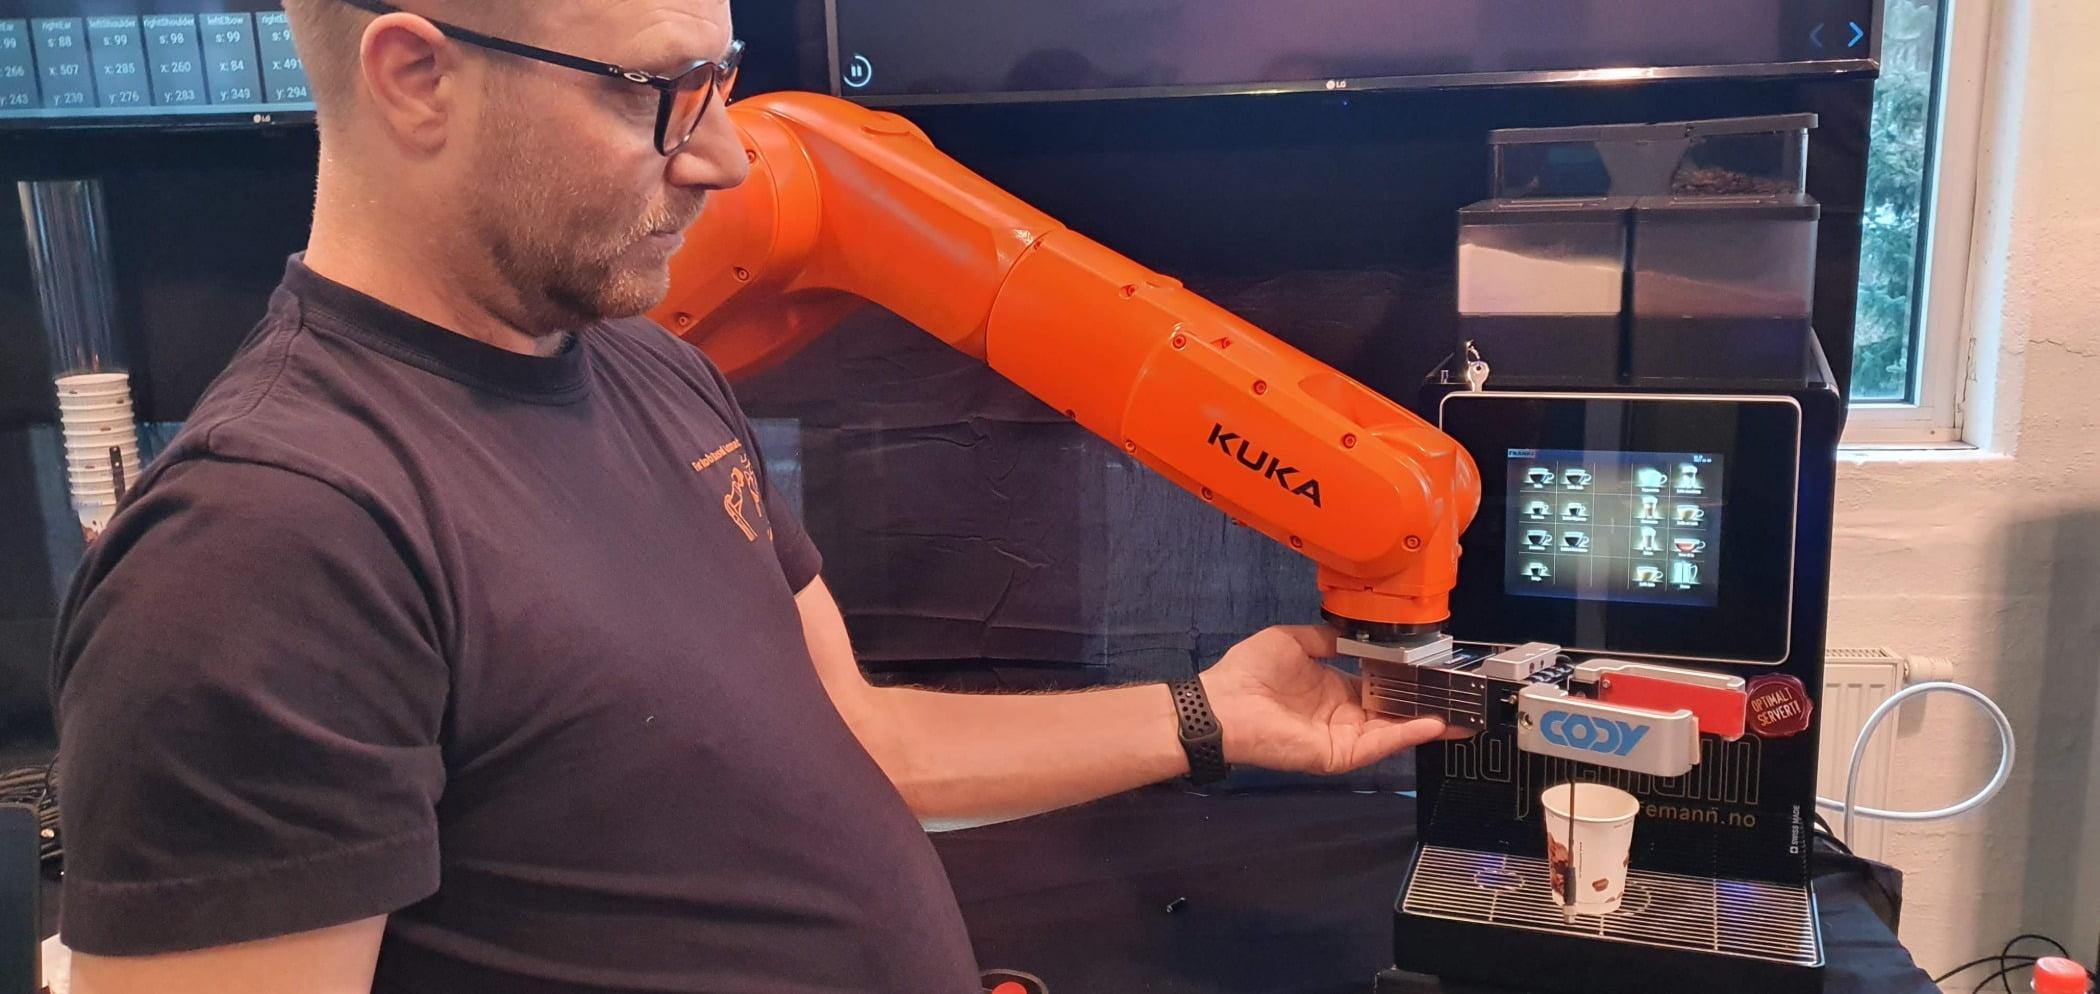 Human body, Glasses, Hand, Arm, Orange, Vehicle, Finger